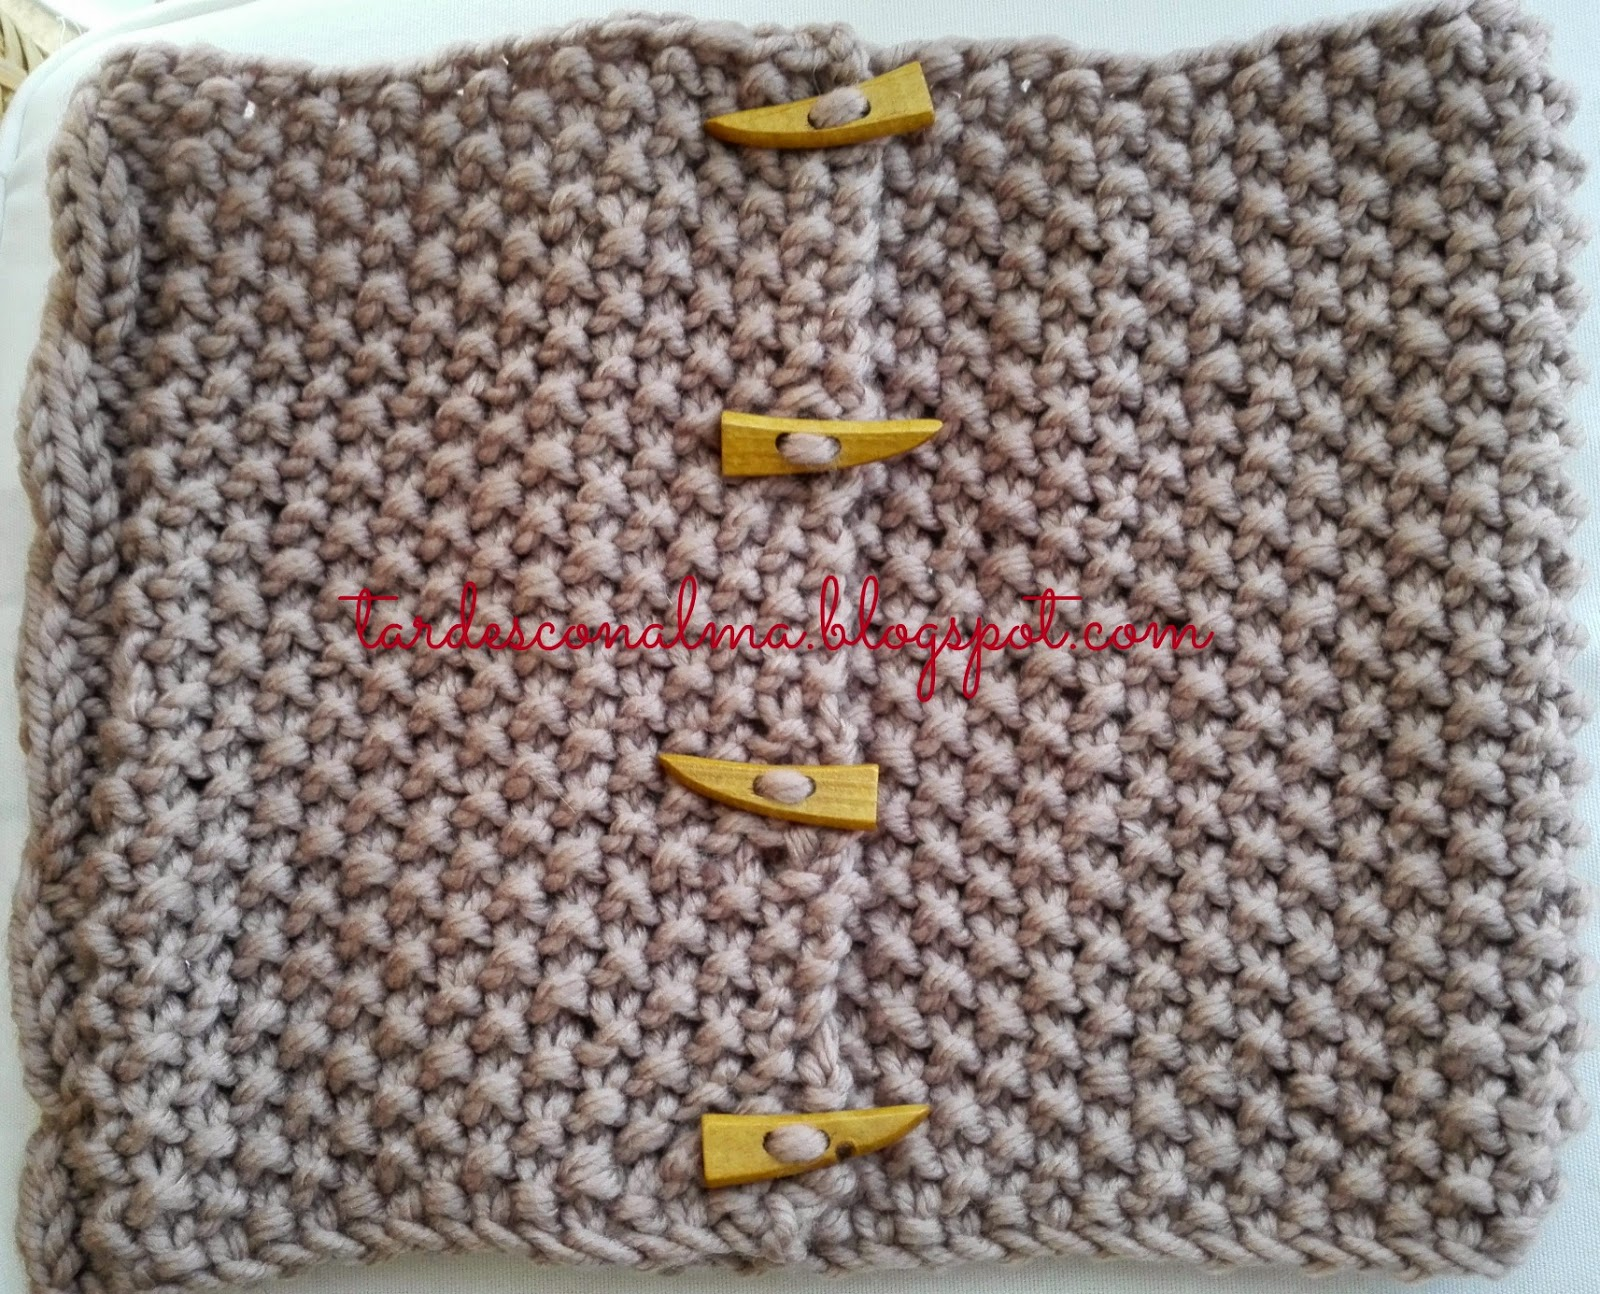 tardesconalma.blogspot.com tutorial DIY bufanda modelo Octo foto4